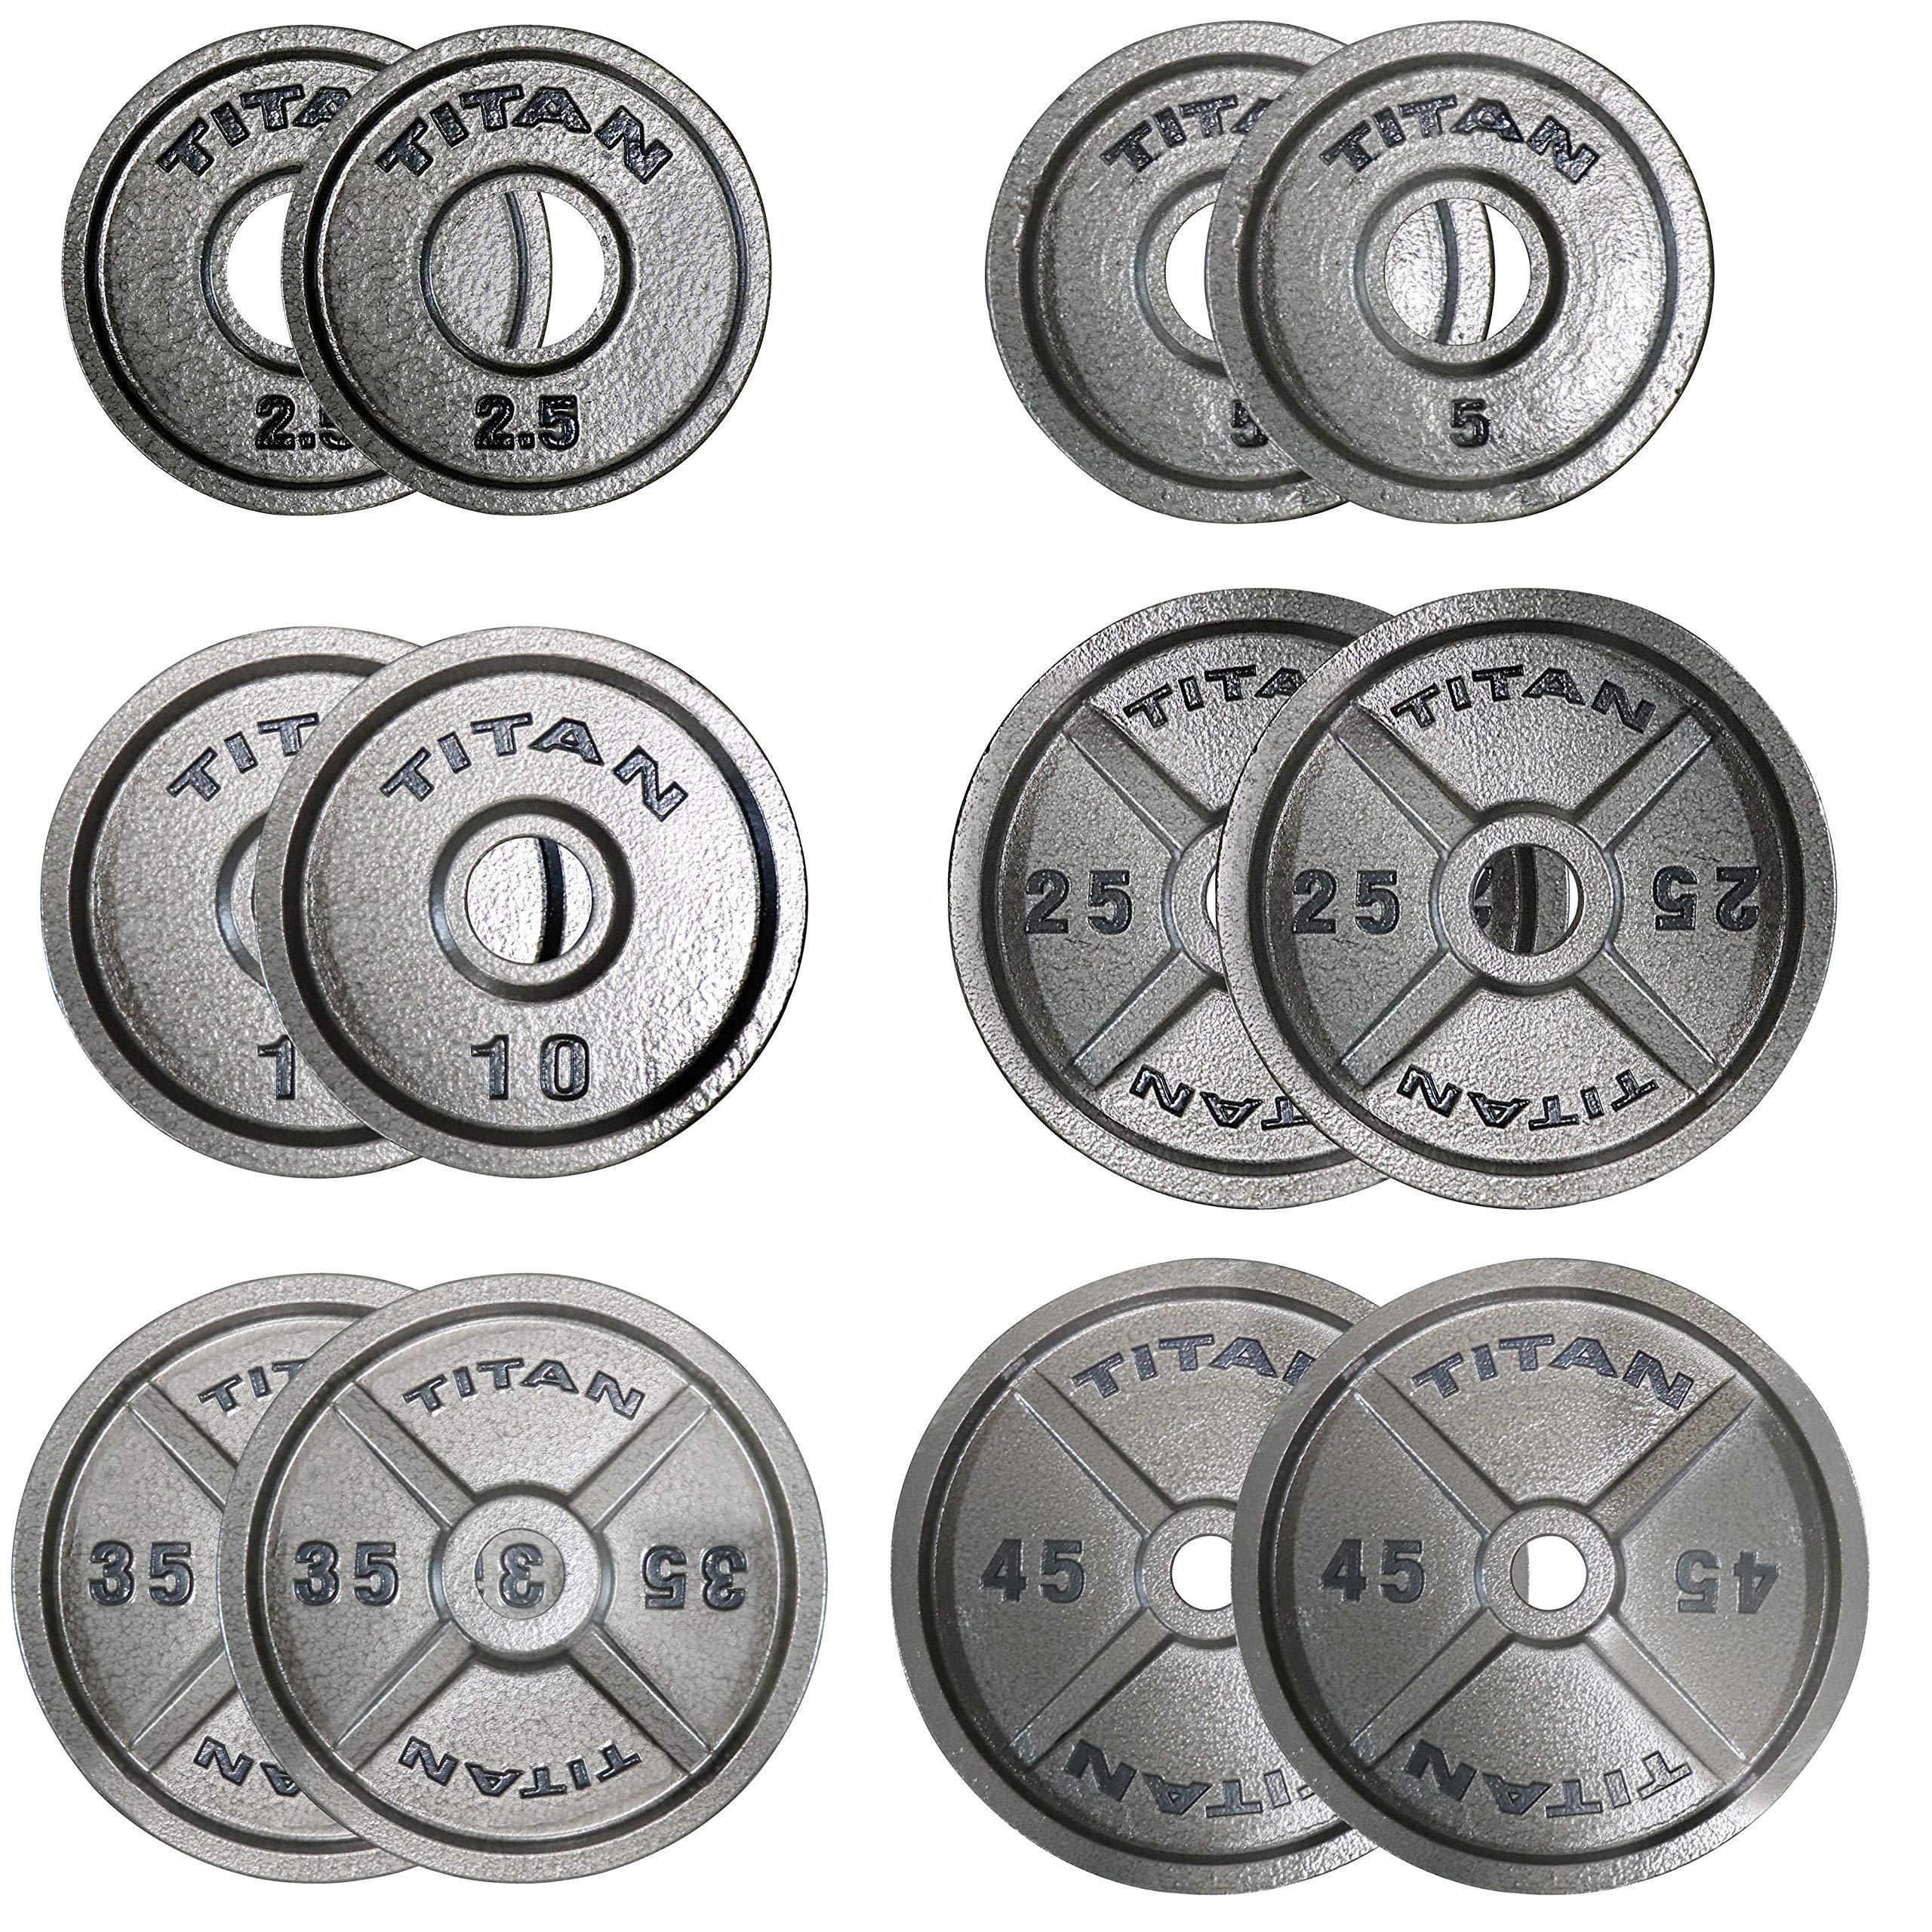 Titan Cast Iron Olympic Weight Plates | 245 LB Set